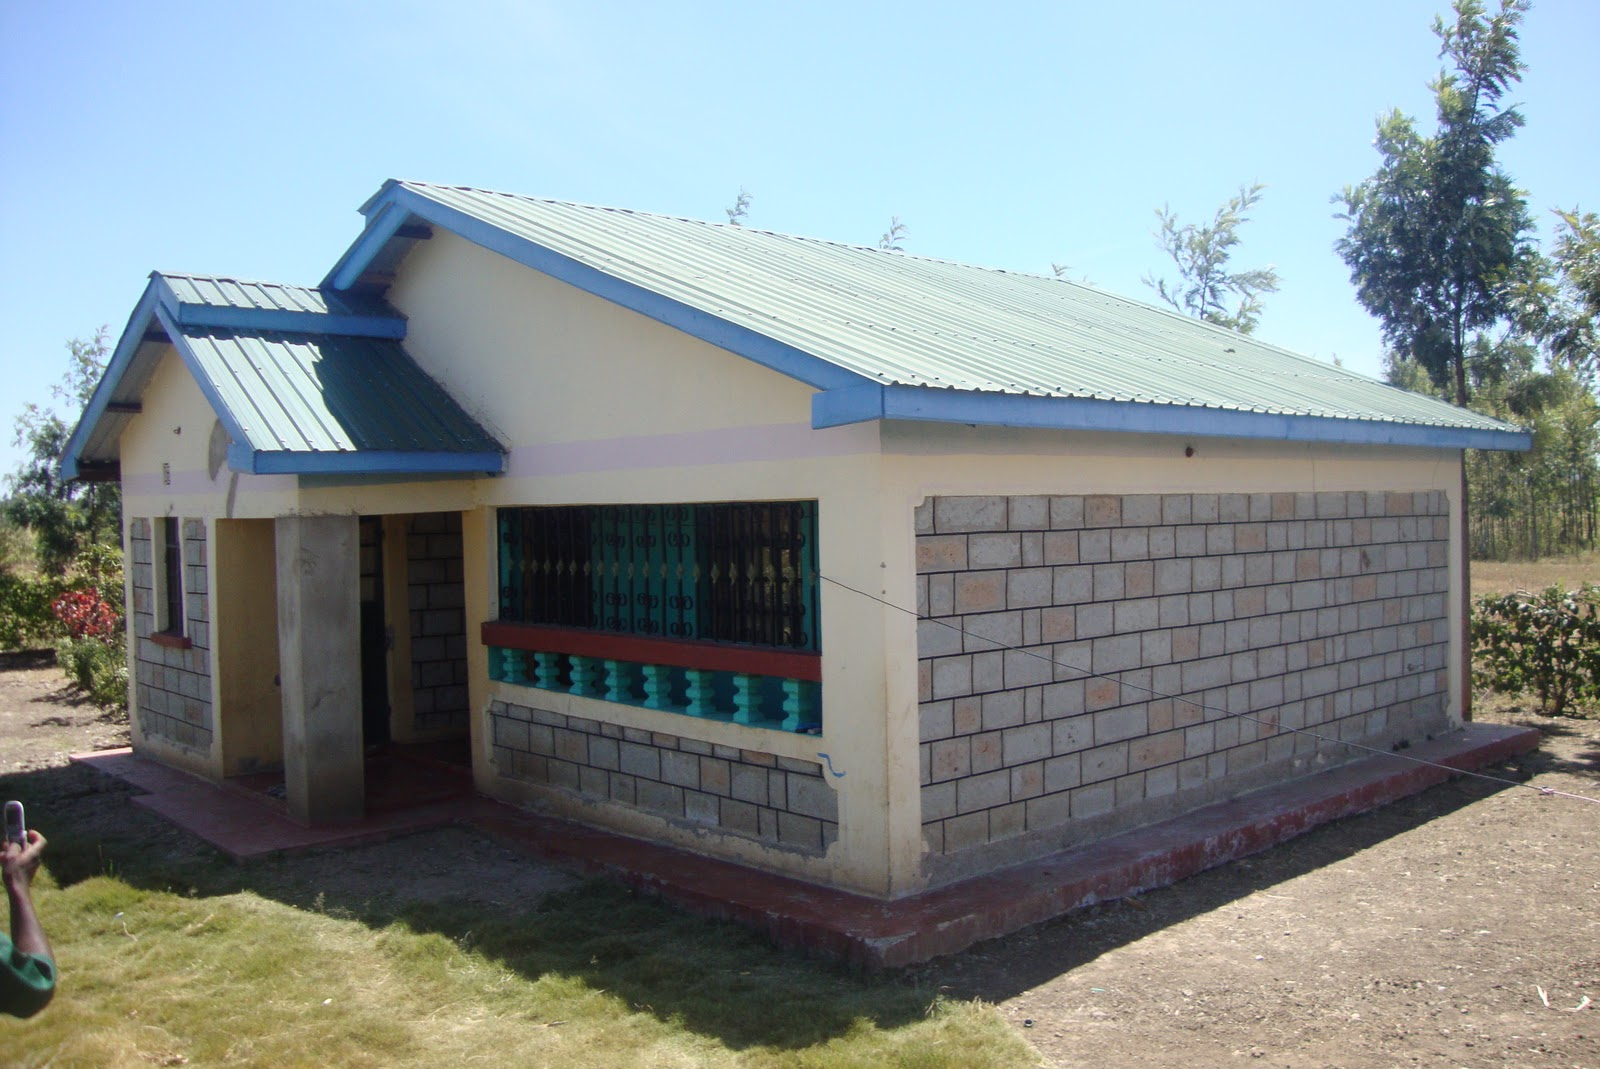 Thika prime land plots houses for sale thika kenol house for sale - Houses for small plots of land ...